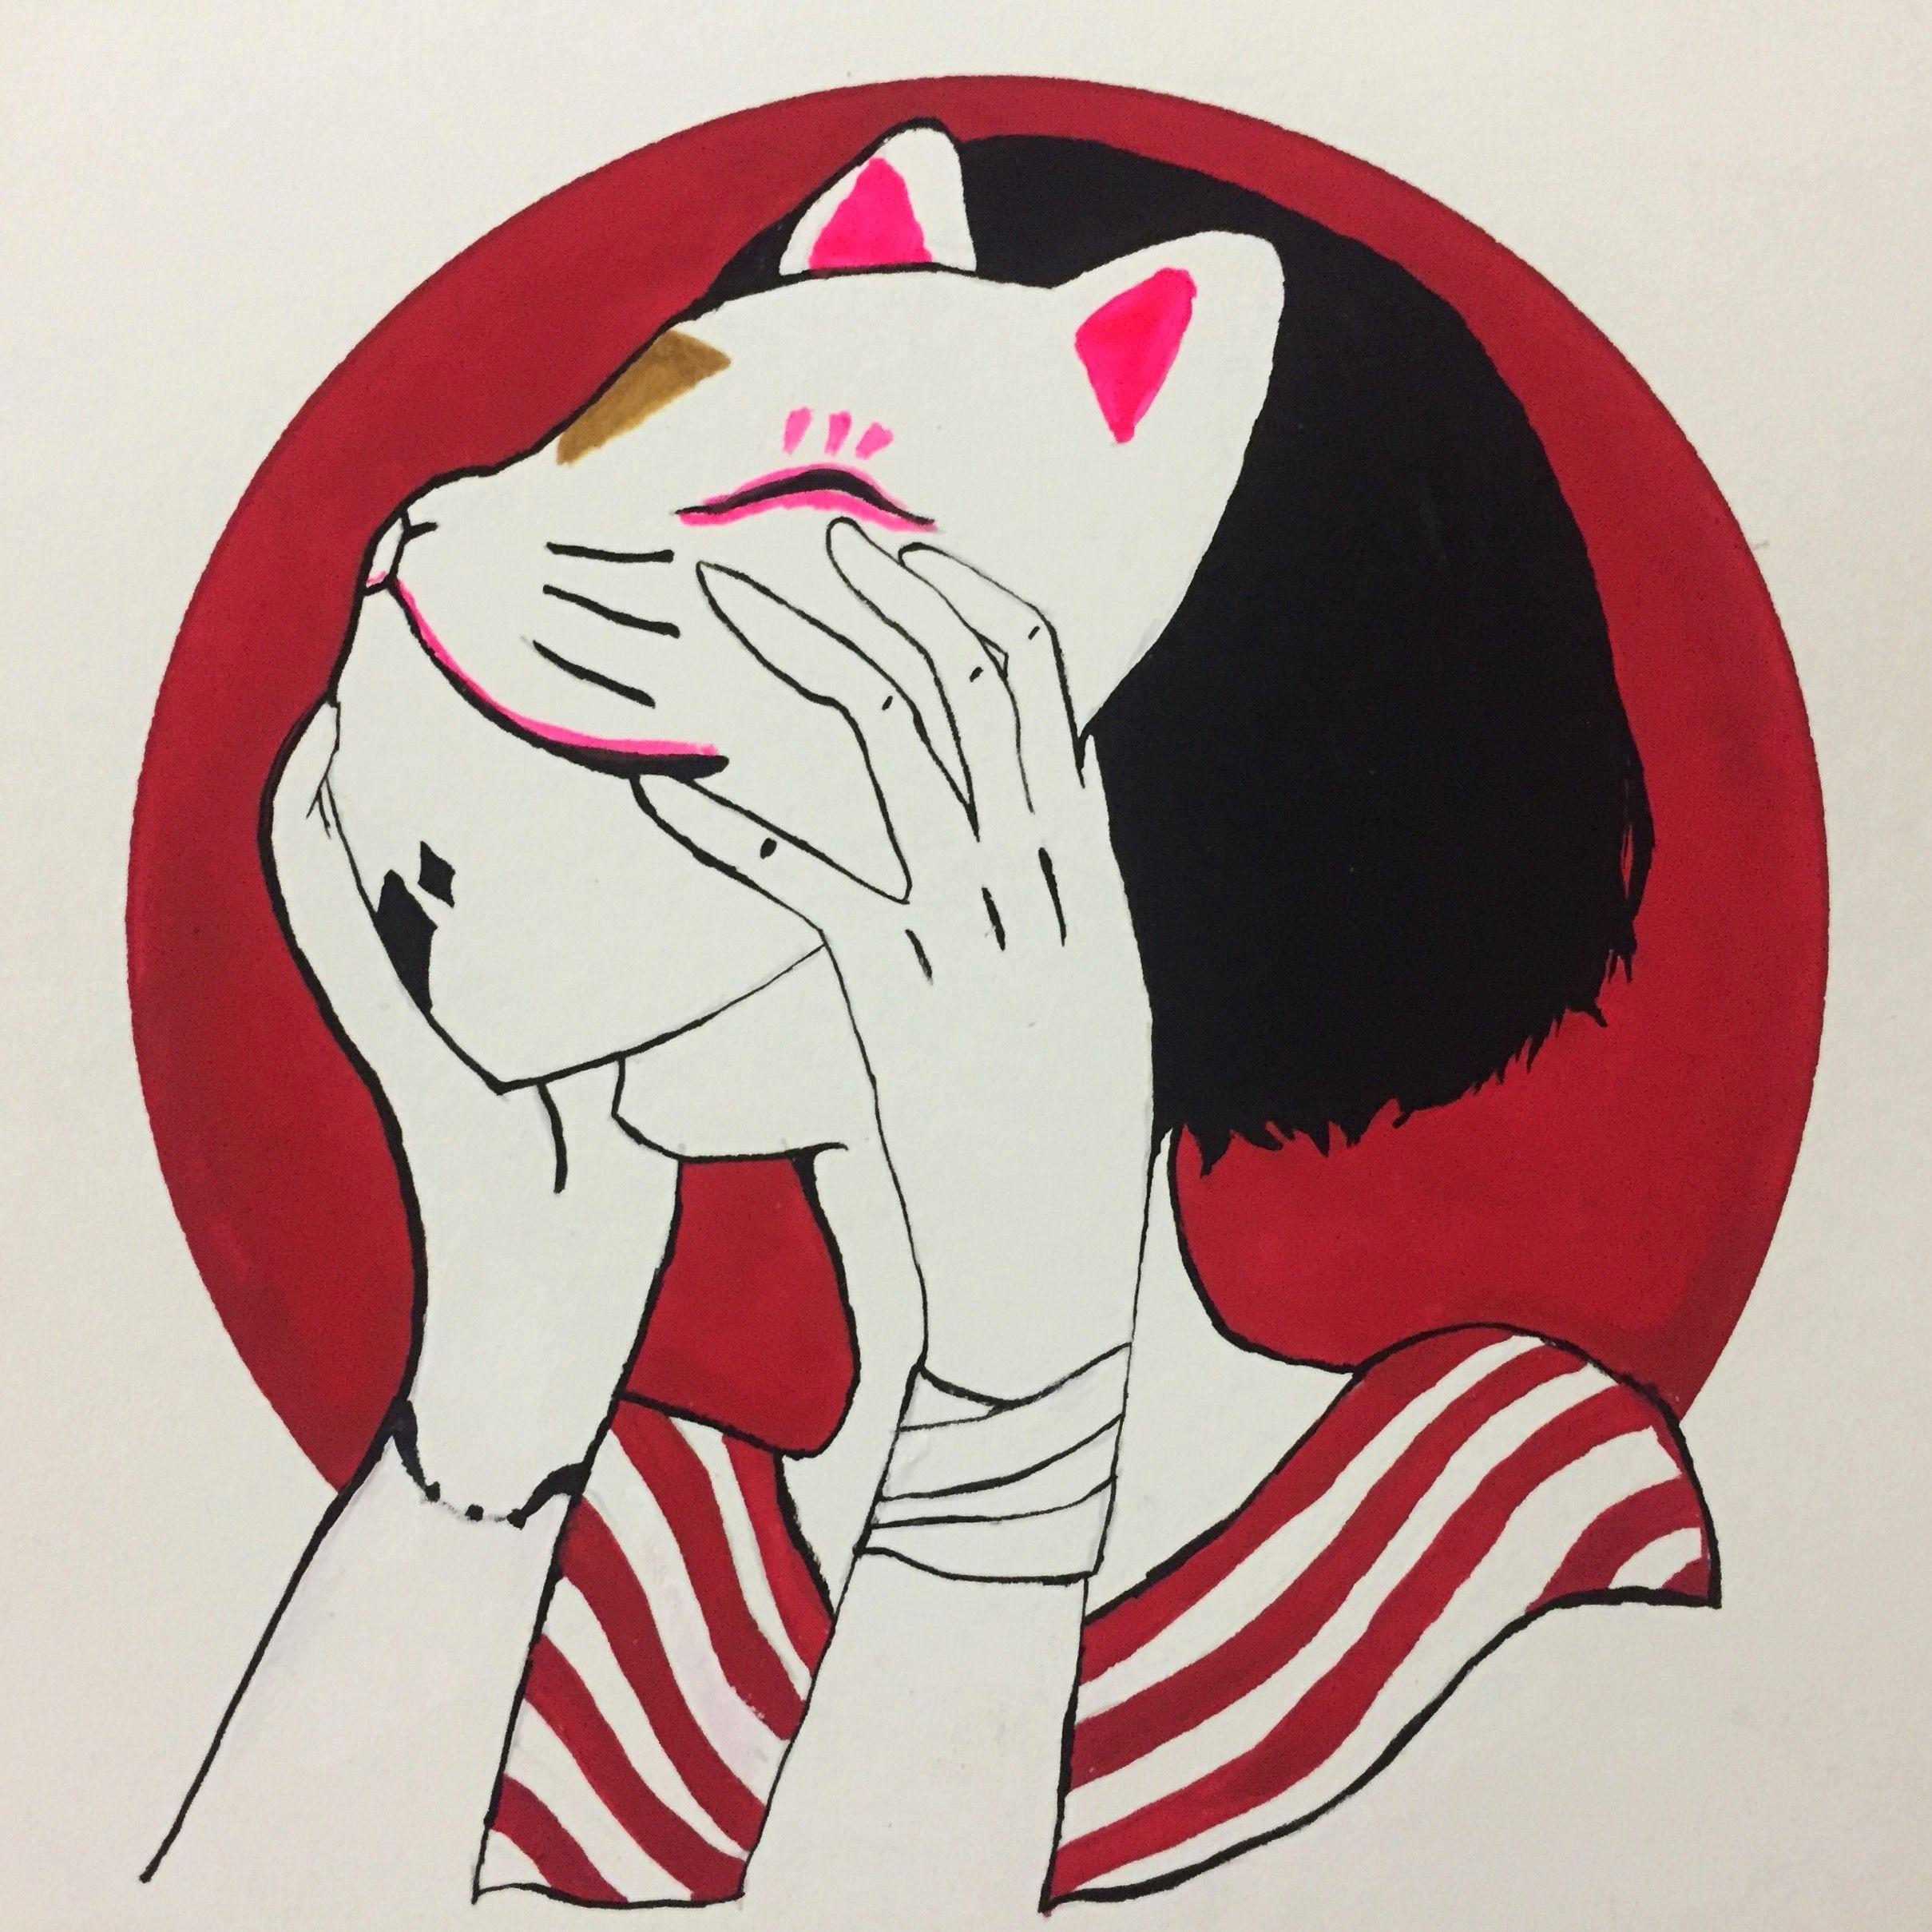 cat mask girl mask girl animation cat mask tattoos drawings image